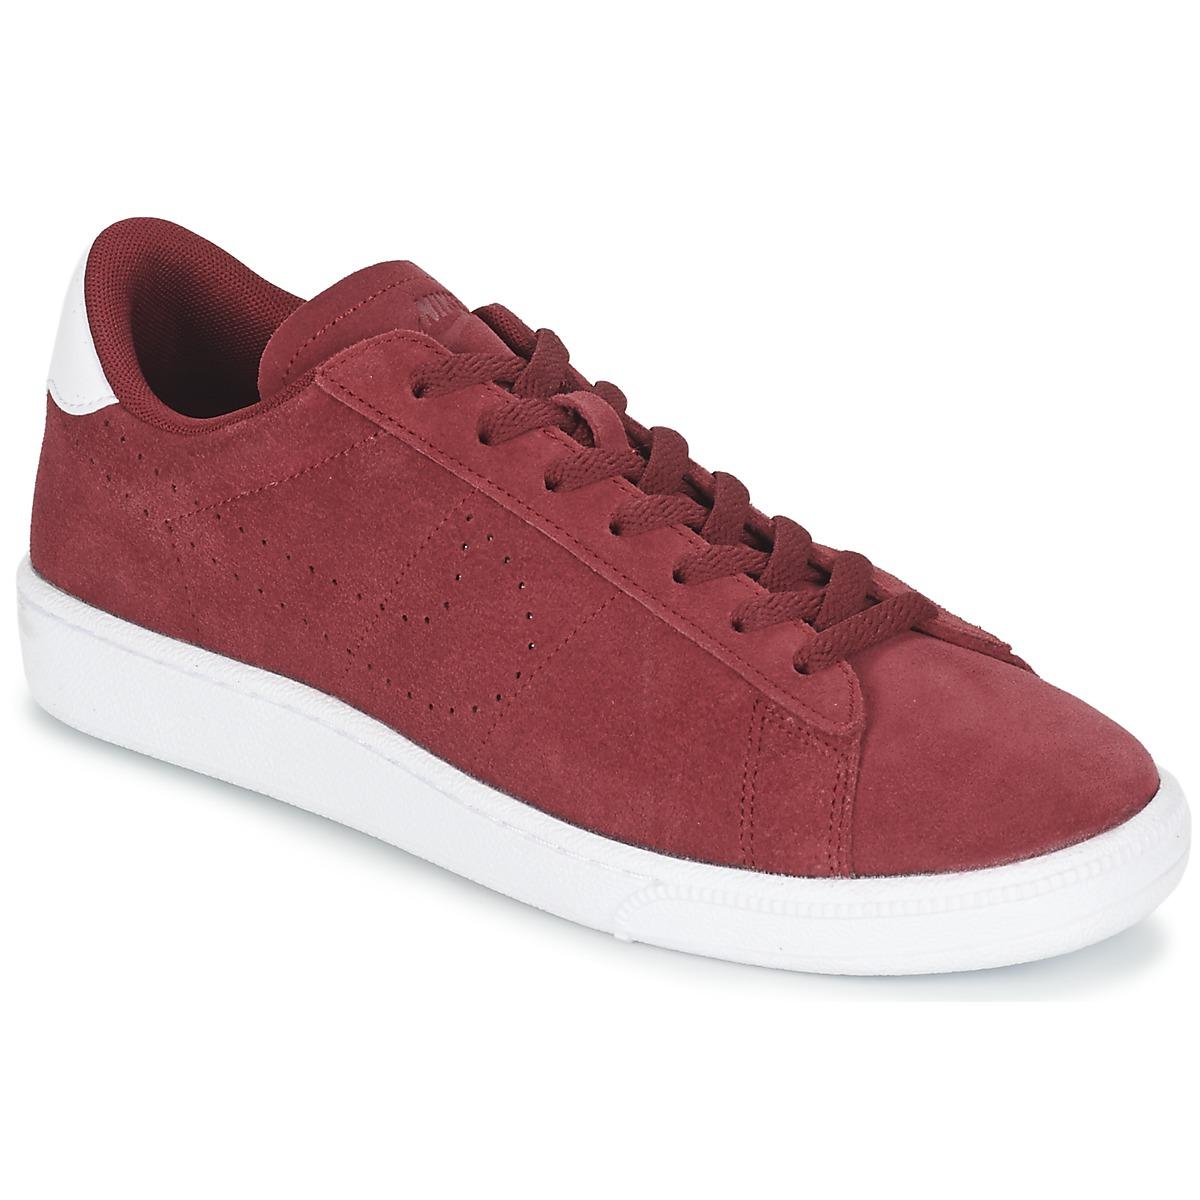 Nike TENNIS CLASSIC CS SUEDE Rouge